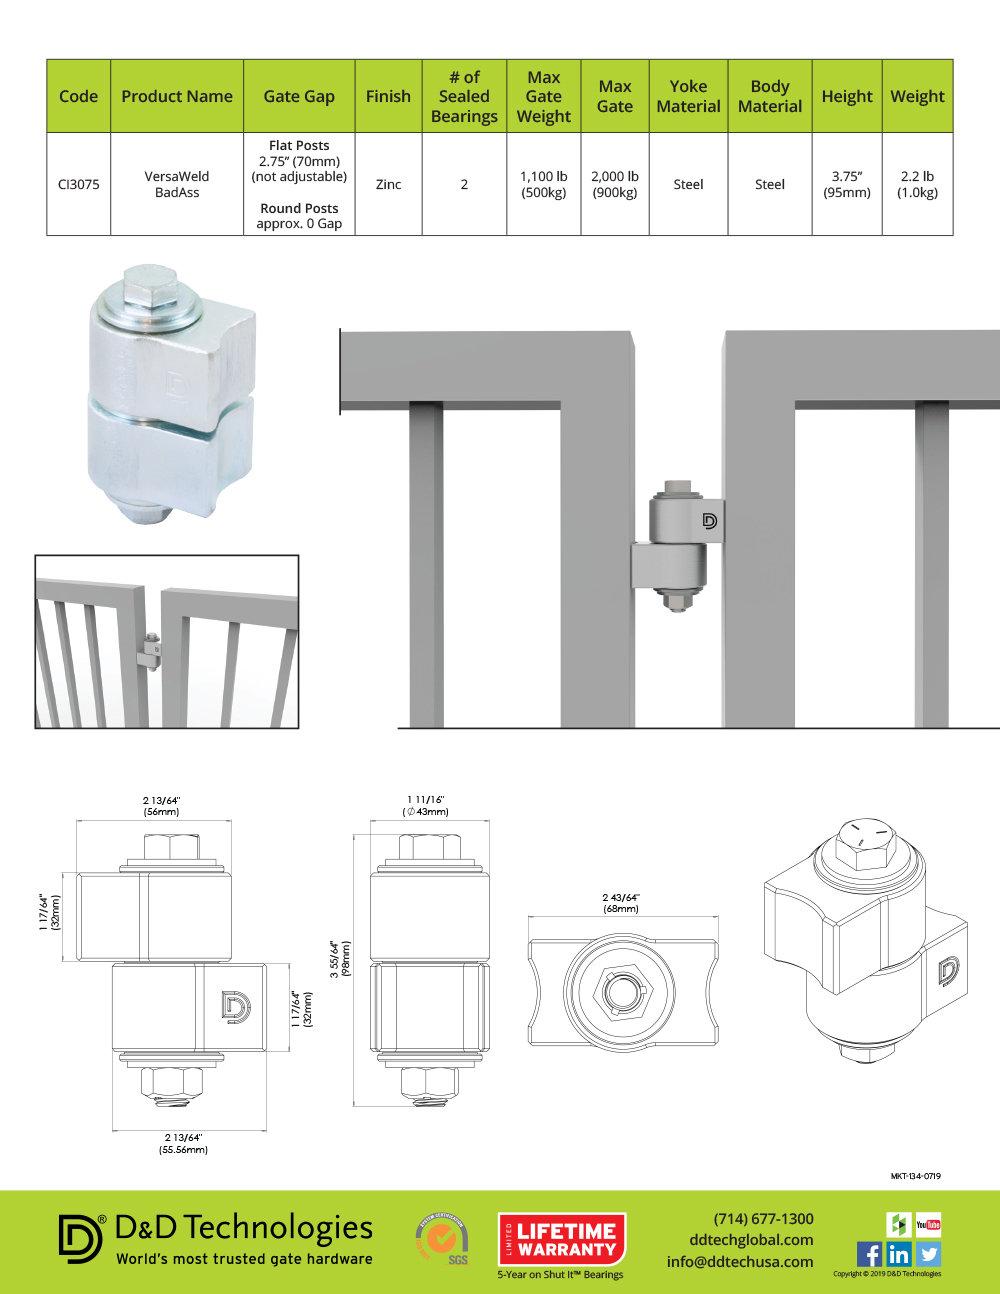 Shut It VersaWeld BadAss Gate Hinge Sell Sheet by Richard